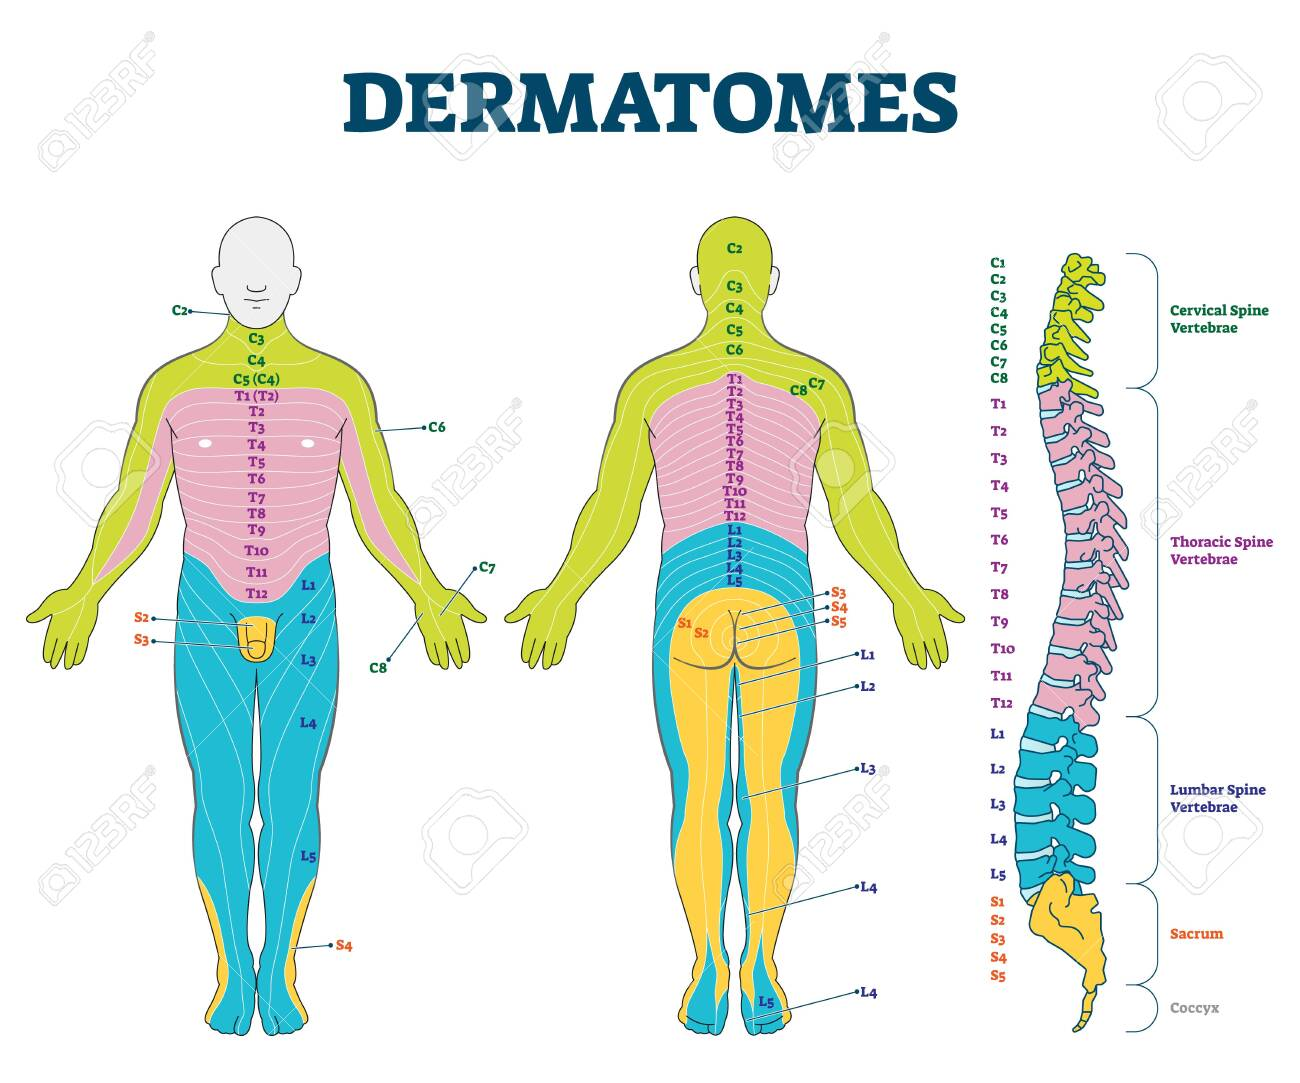 Dermatomes vector illustration. Labeled educational anatomical skin parts scheme. Epidermis area supplied by afferent spinal nerve fibers. Cervical, thoracic, lumbar and sacral nerves division diagram - 142519115